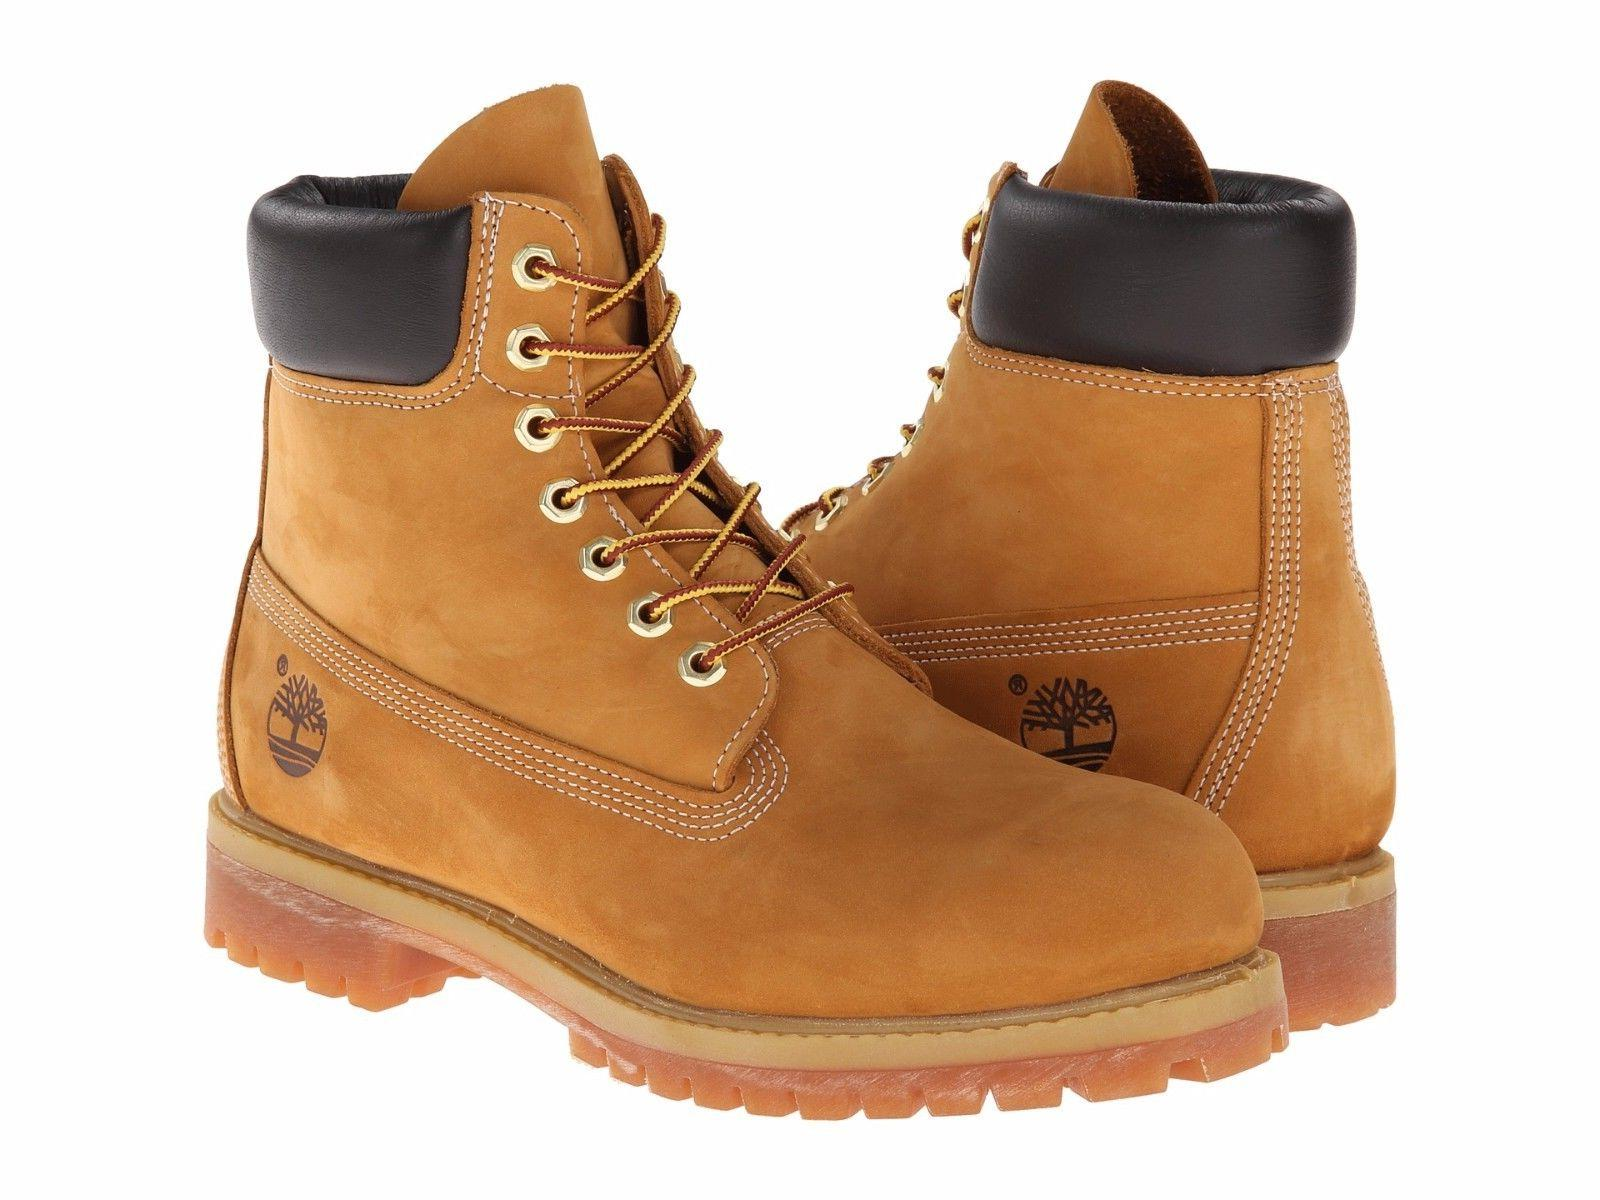 Men's Shoes Timberland 6 INCH PREMIUM Waterproof Boots 10061